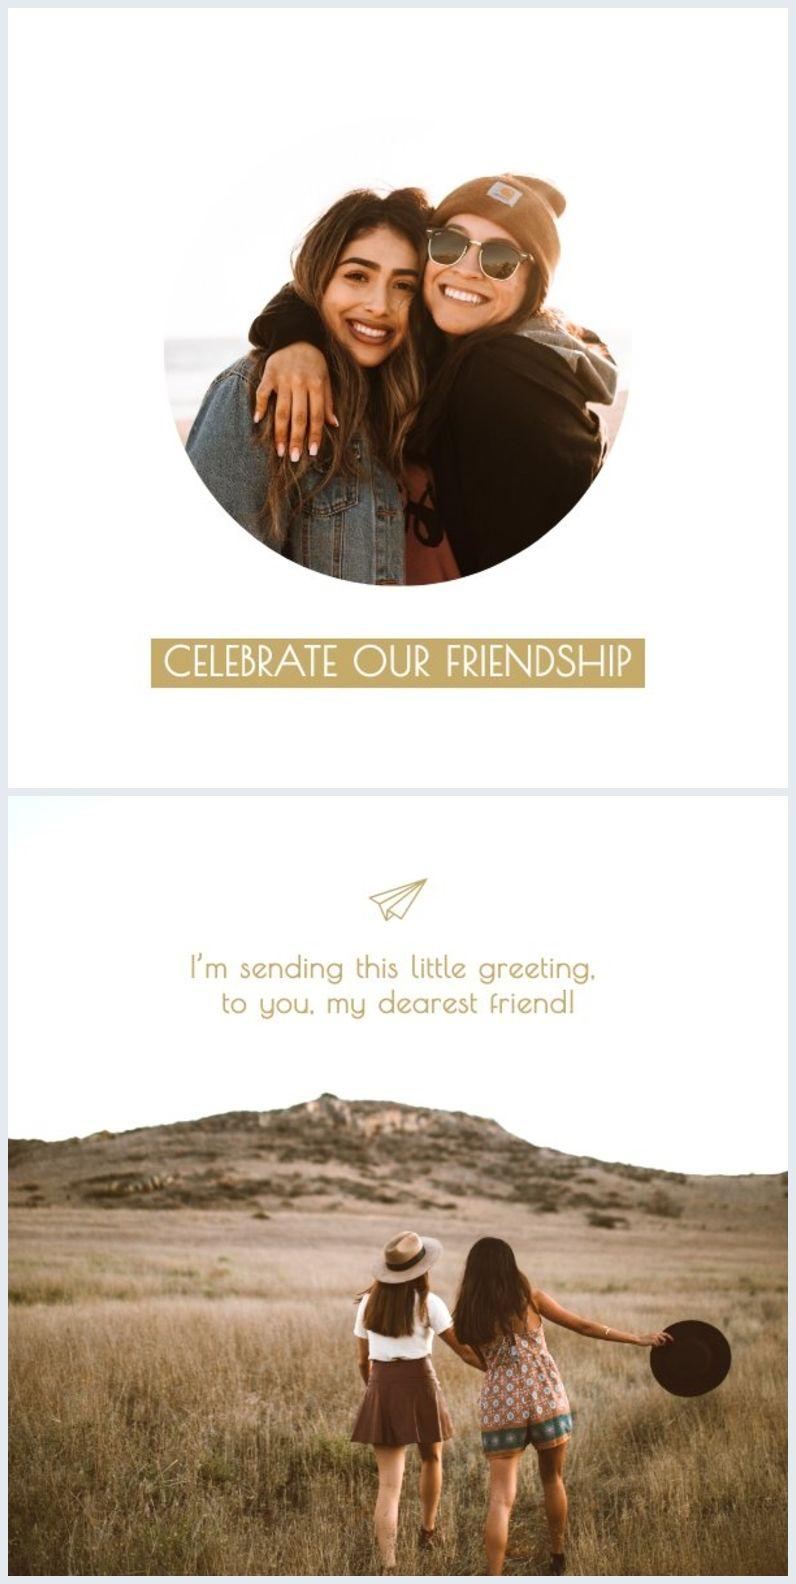 Printable Friendship Card Template Friendship Cards Friendship Printables Card Template